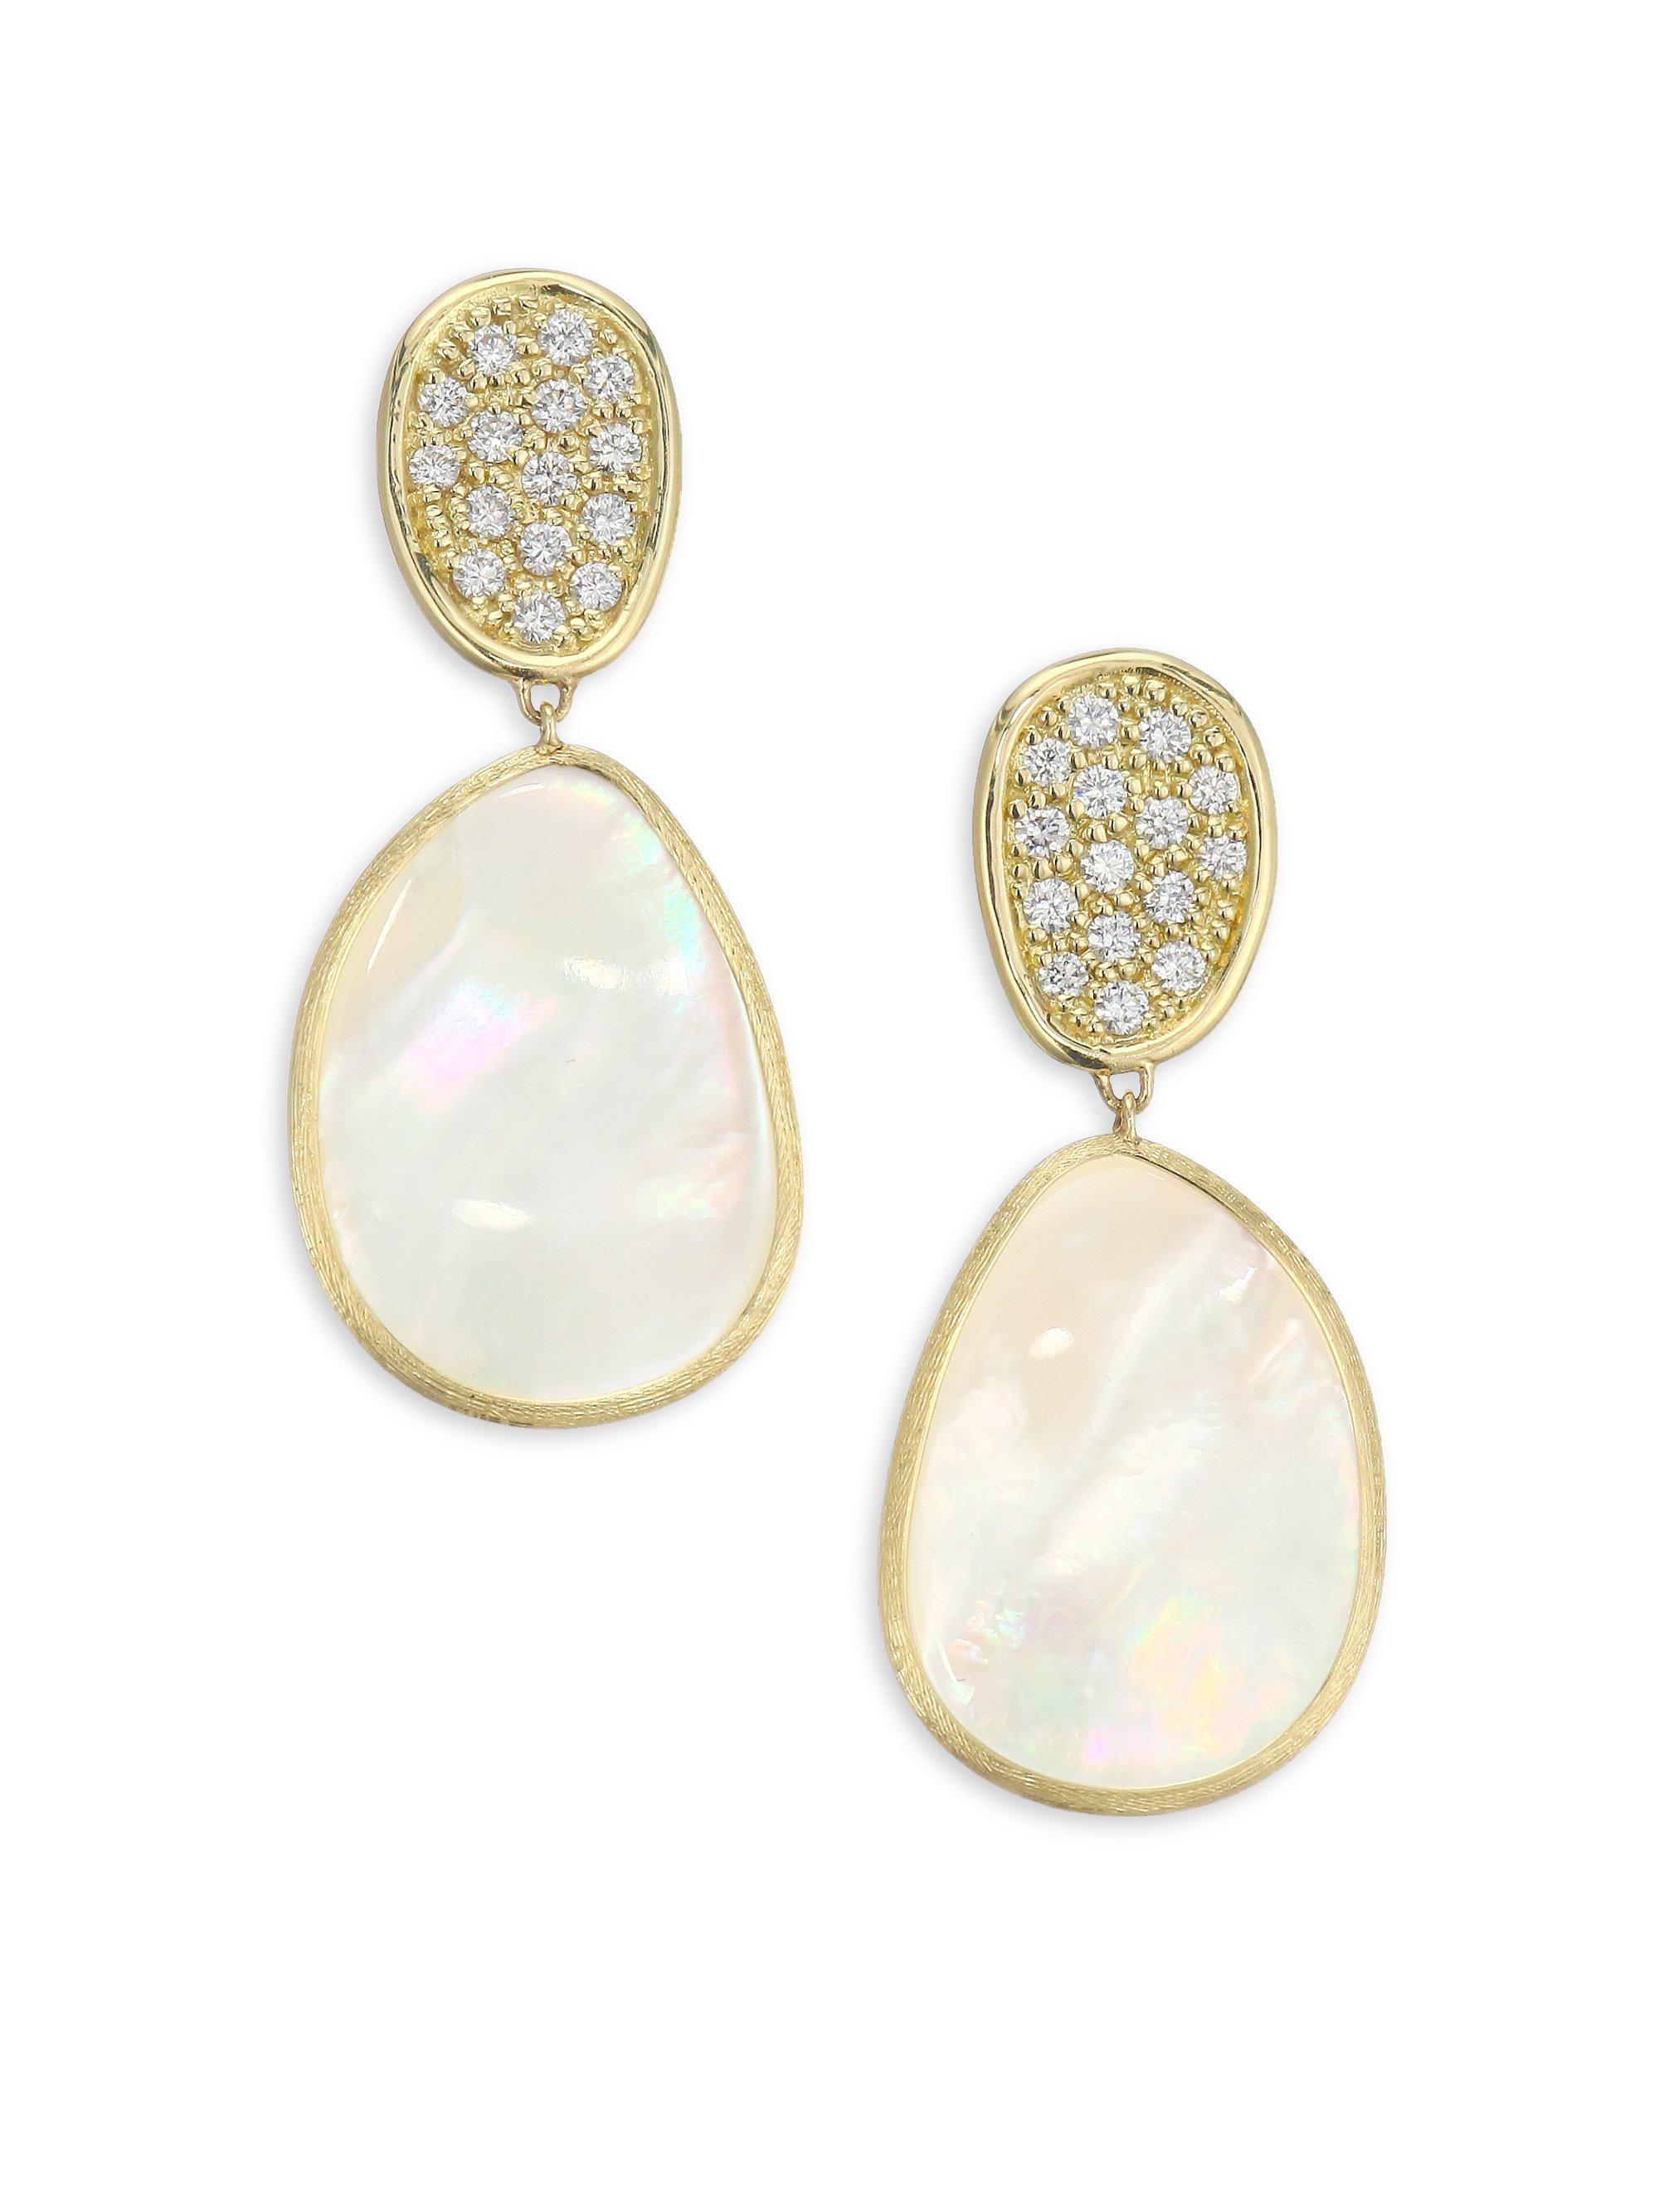 Marco Bicego 18k Mother-of-Pearl & Diamond Drop Earrings nBs6Ii